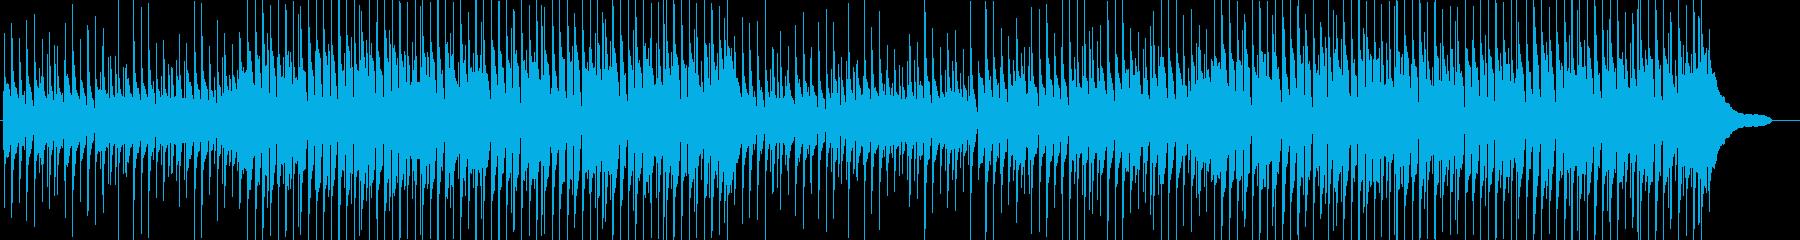 Happy Ukulele 17の再生済みの波形